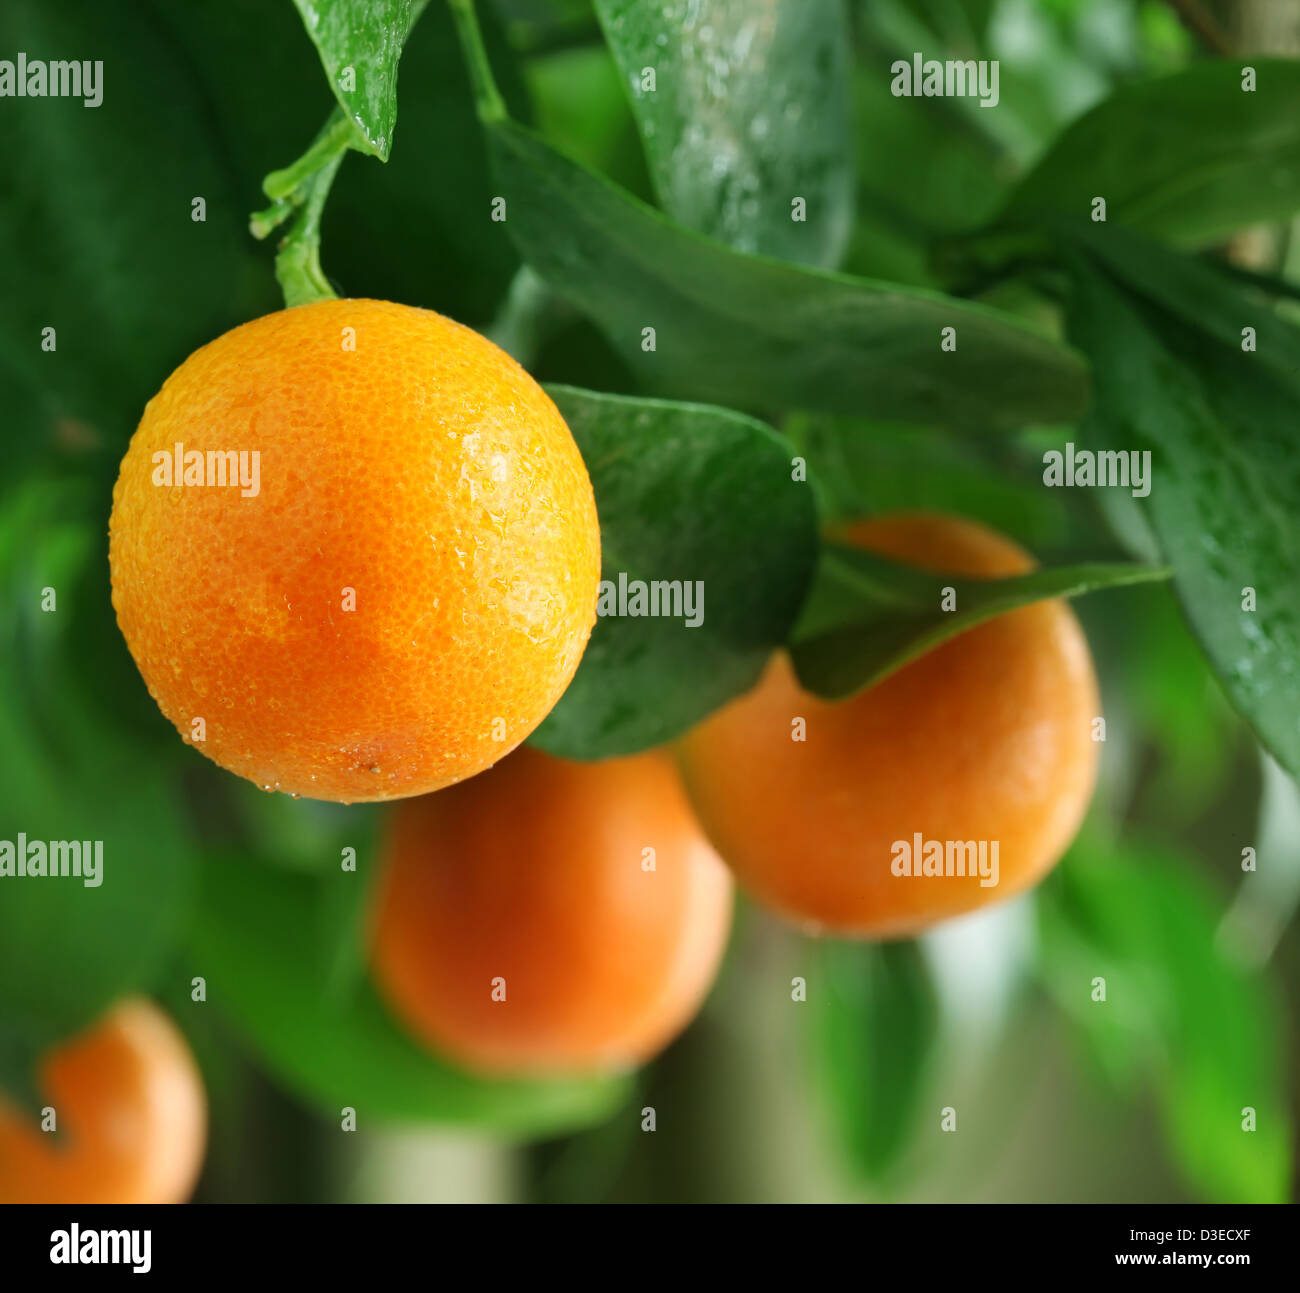 Tangerines on a citrus tree close up. Stock Photo